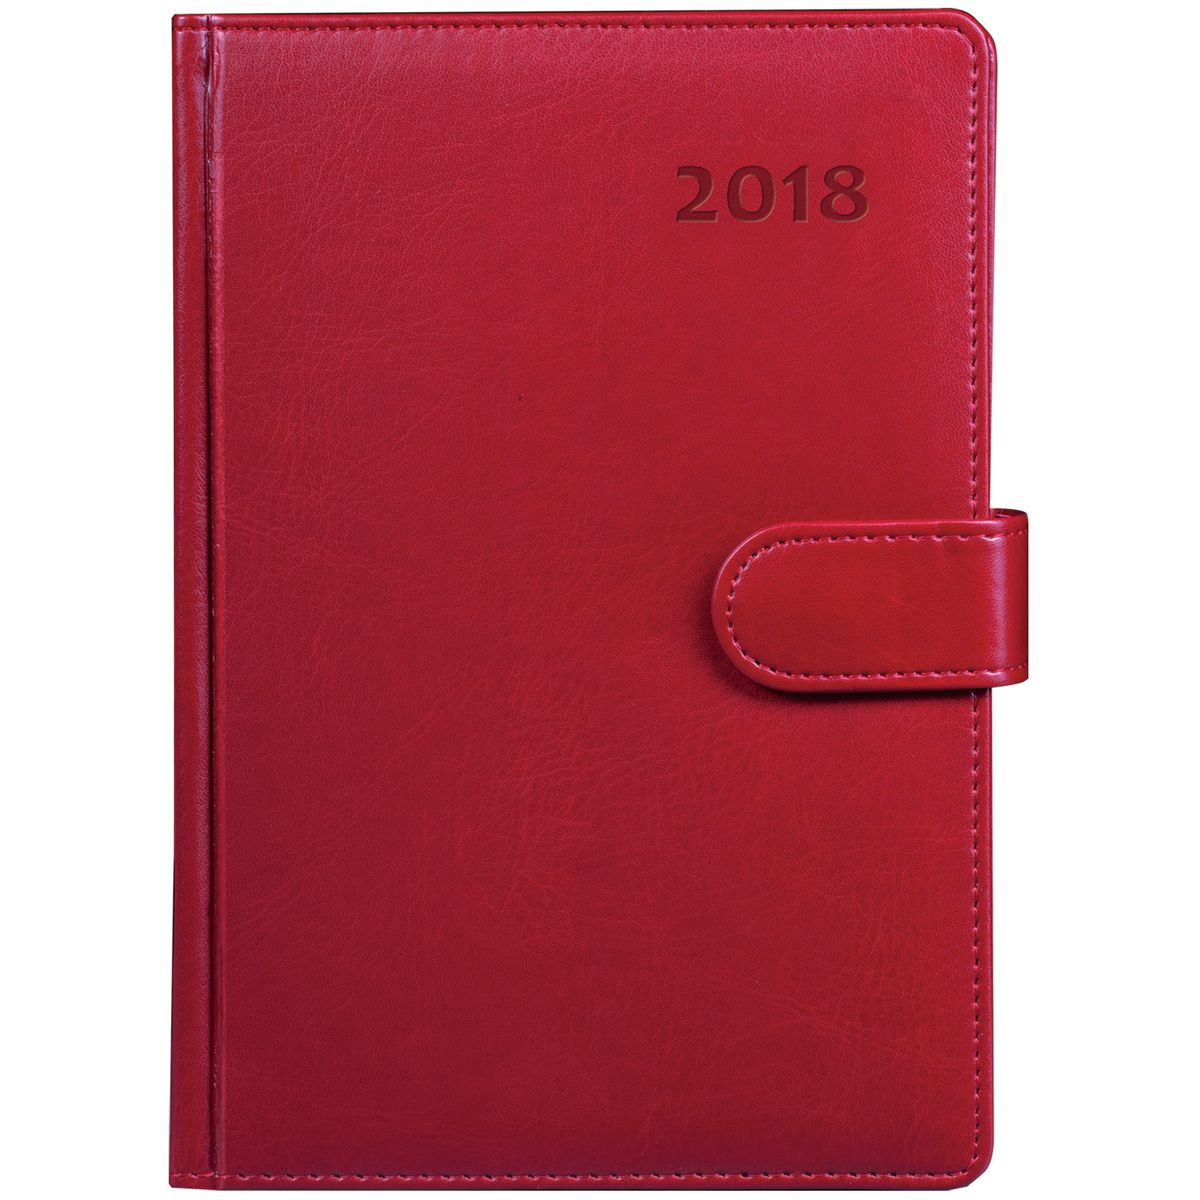 Galant Ежедневник датированный Ritter 2018 формат А5 цвет красный ritter одежда для мужчин